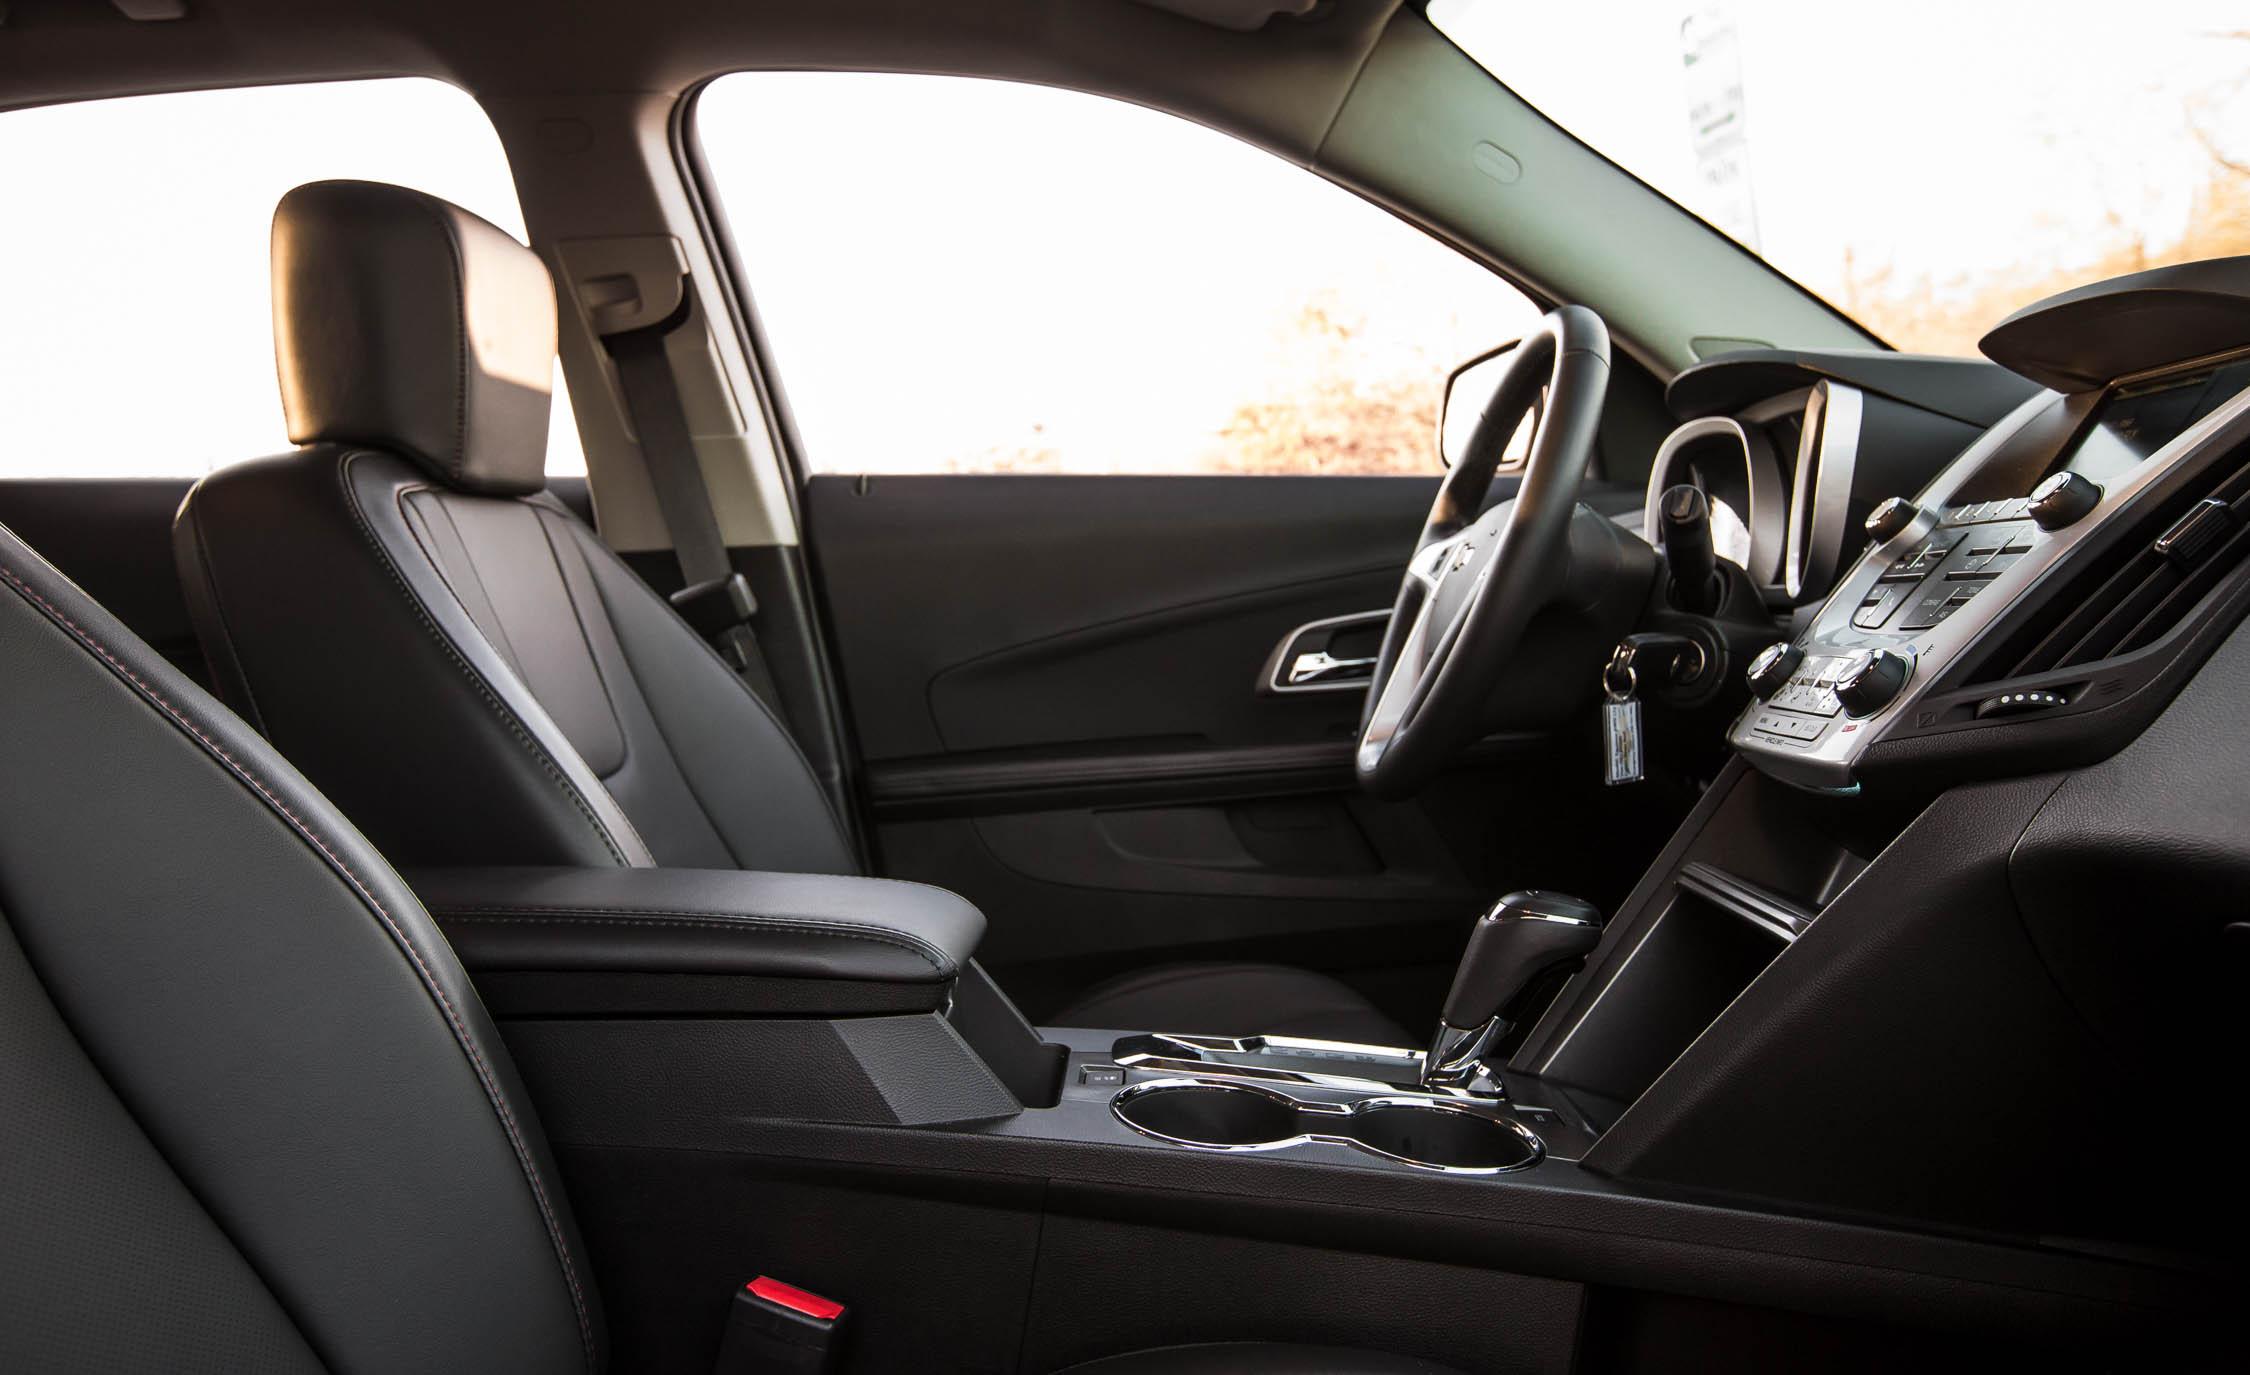 2016 Chevrolet Equinox LTZ Interior Cockpit Seat